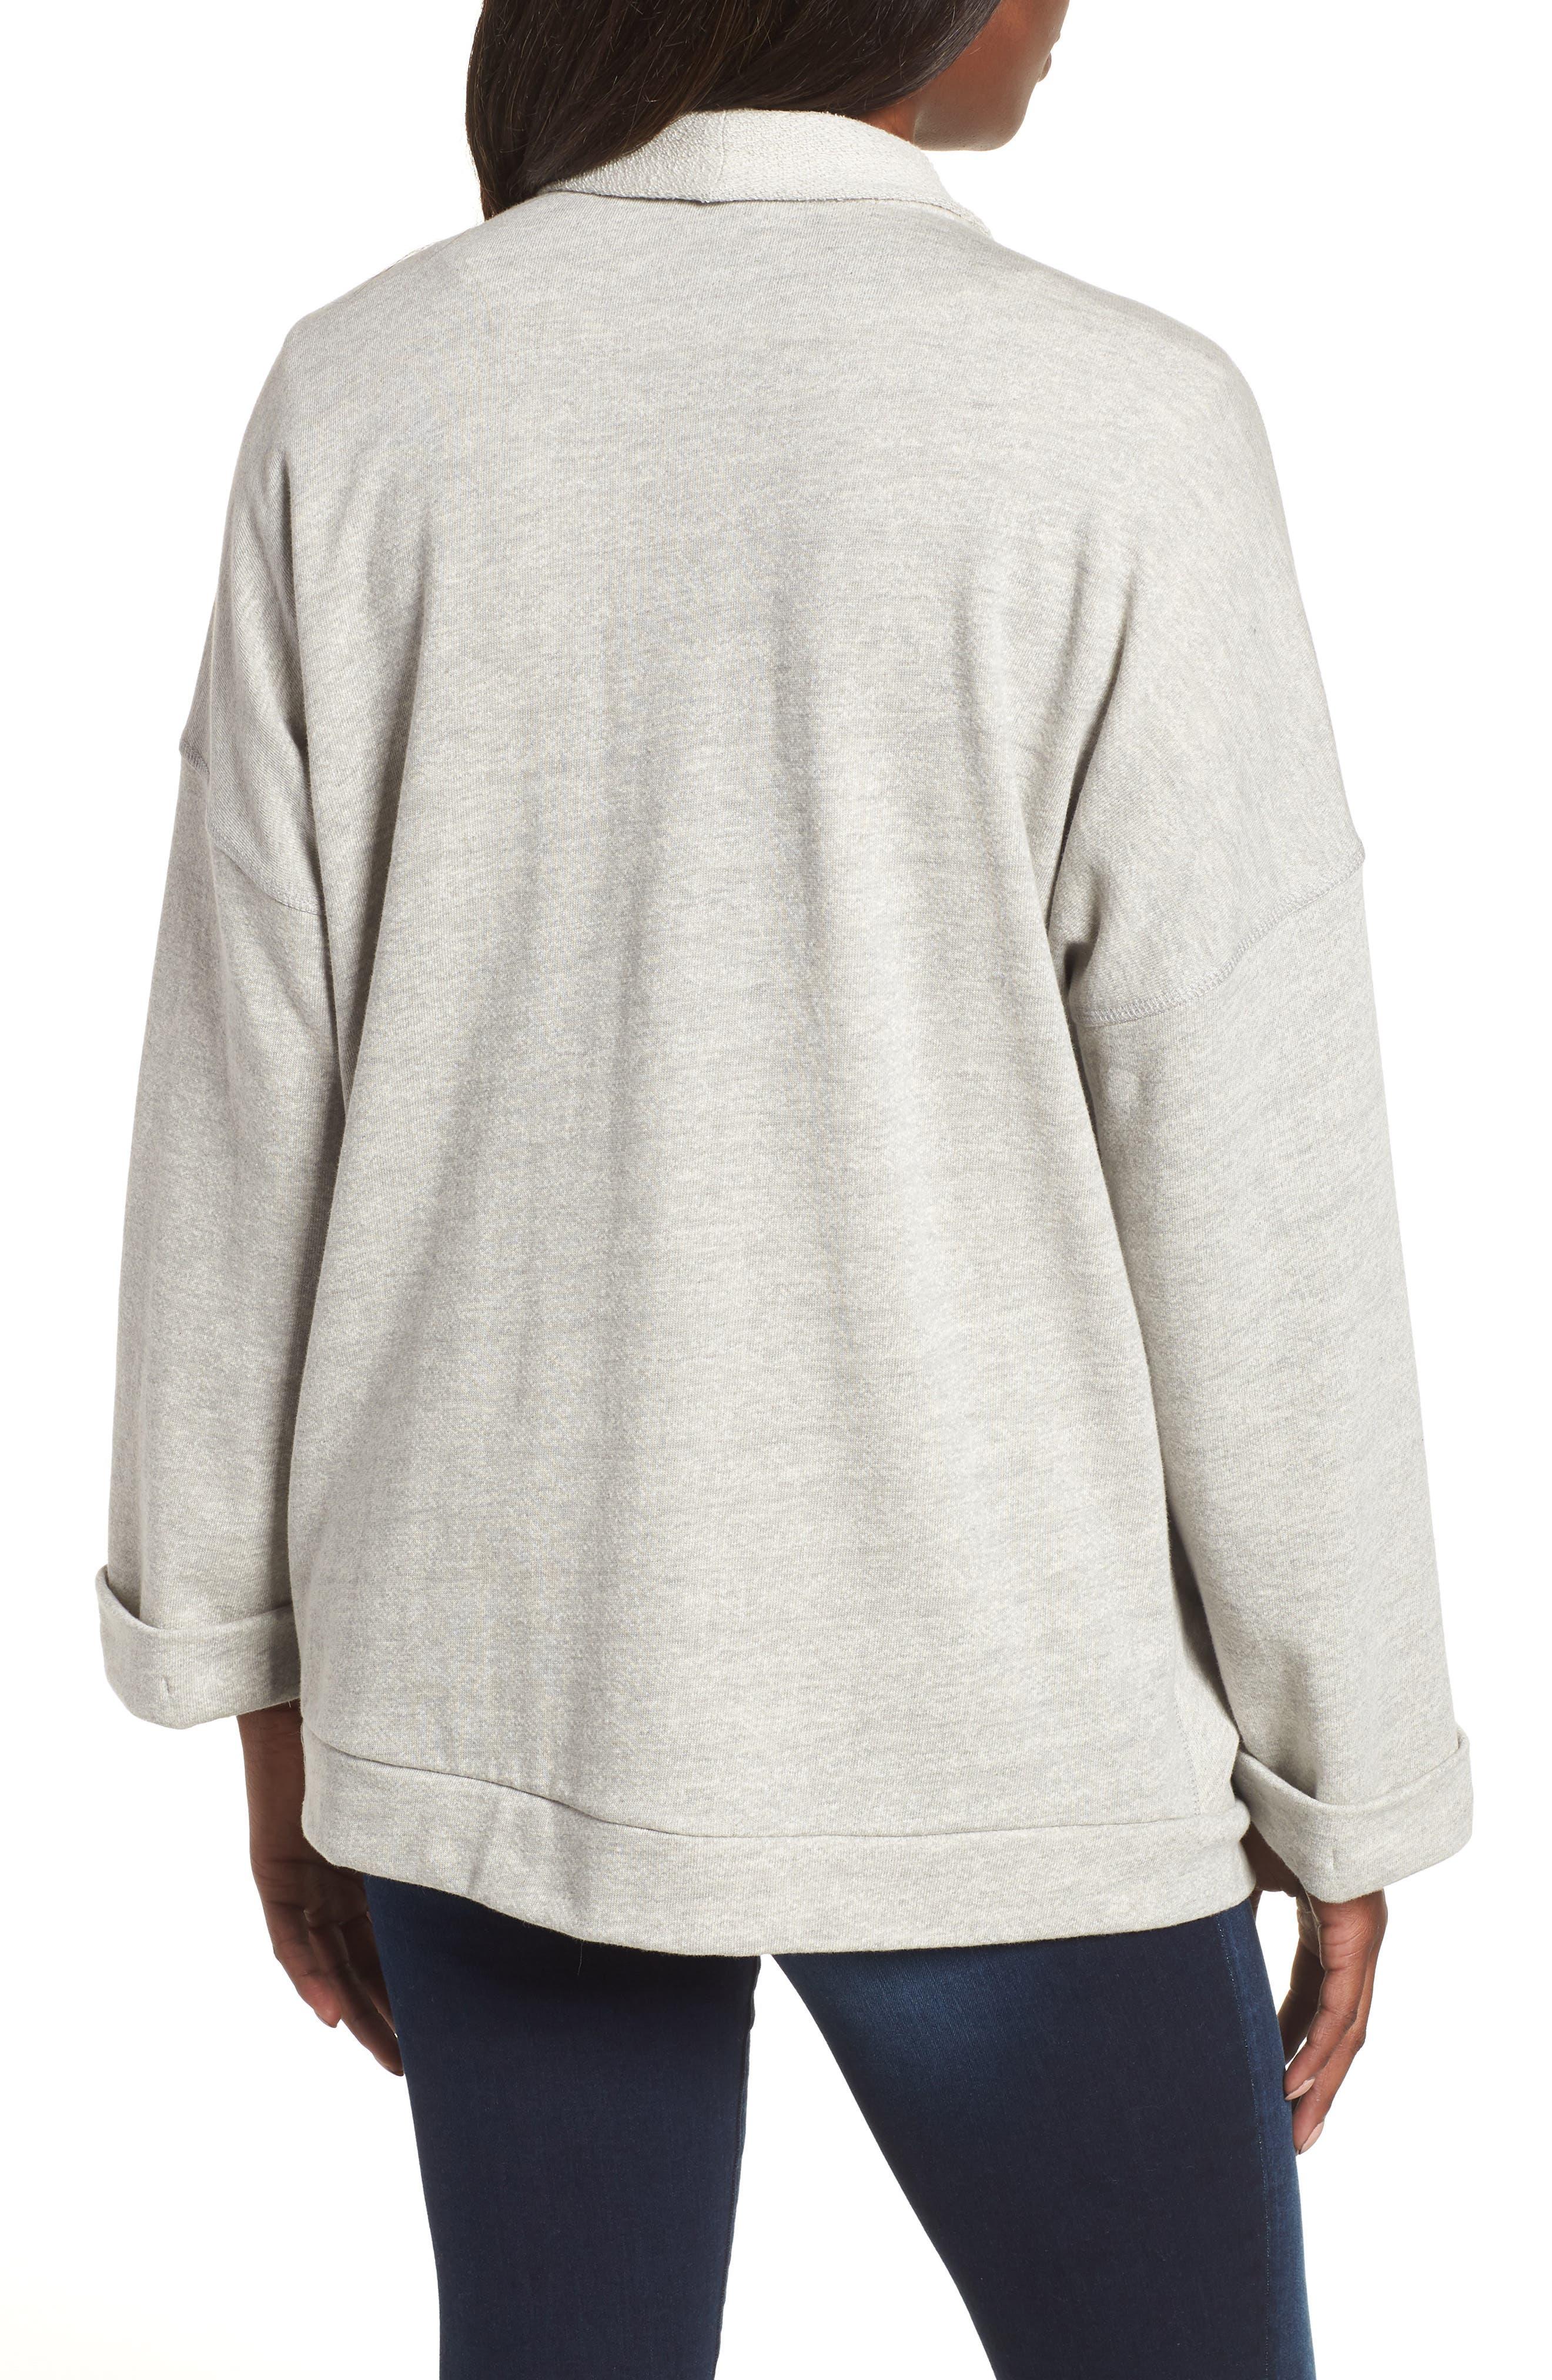 Off-Duty Roll Sleeve Cotton Blend Jacket,                             Alternate thumbnail 2, color,                             Grey Heather